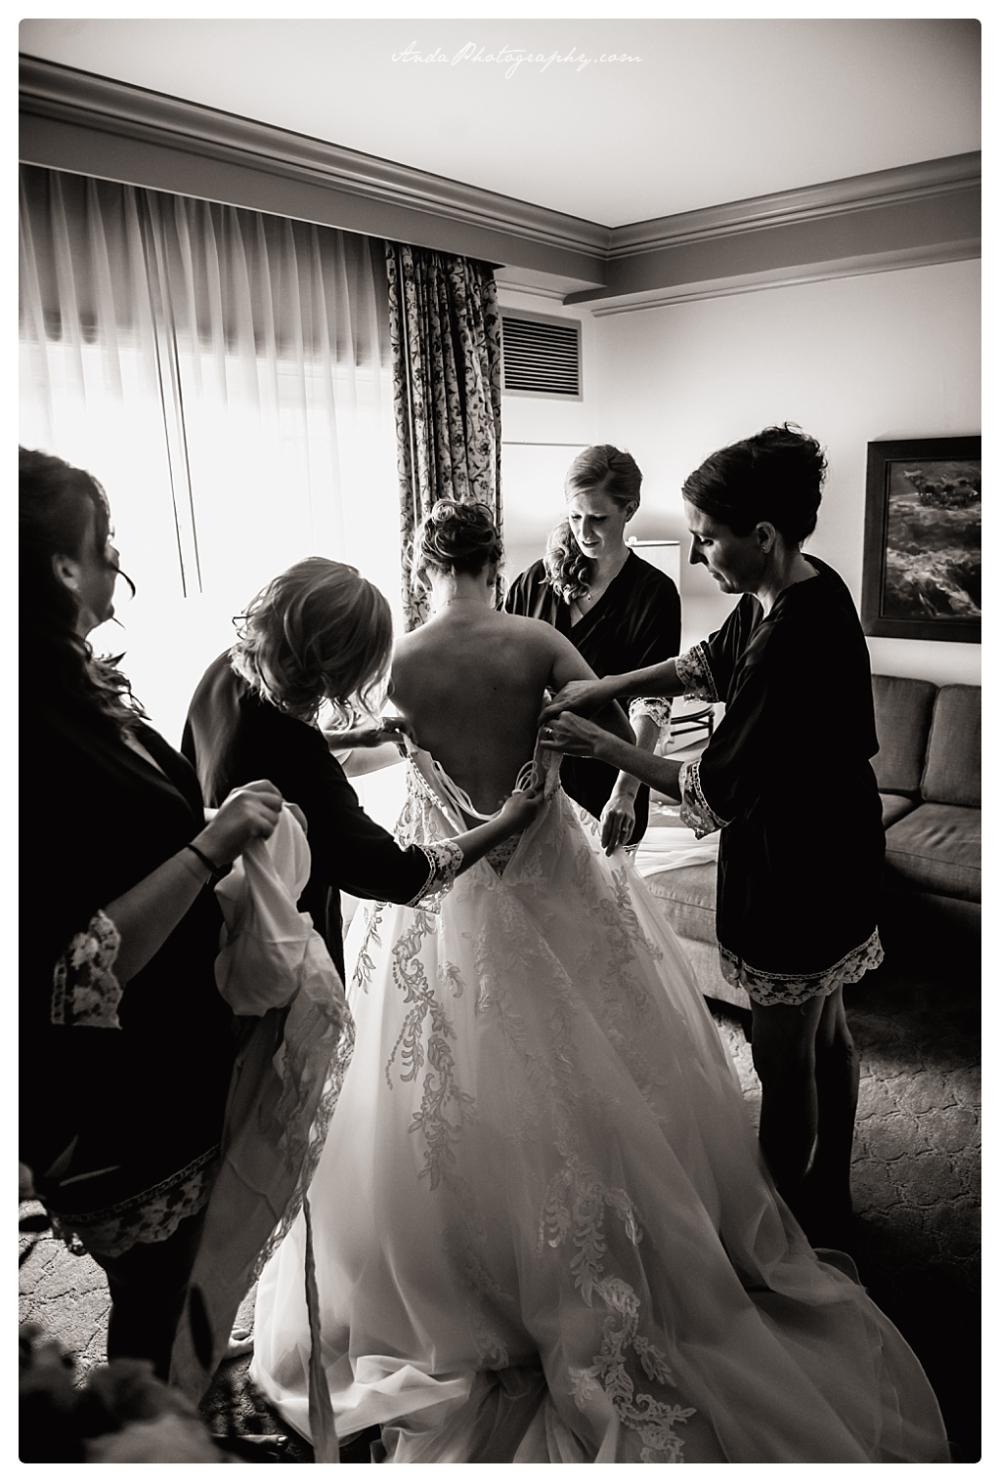 Anda Photography Bellingham wedding photographer Bellingham Yacht Club Wedding lifestyle wedding photographer Seattle Wedding Photographer_0003